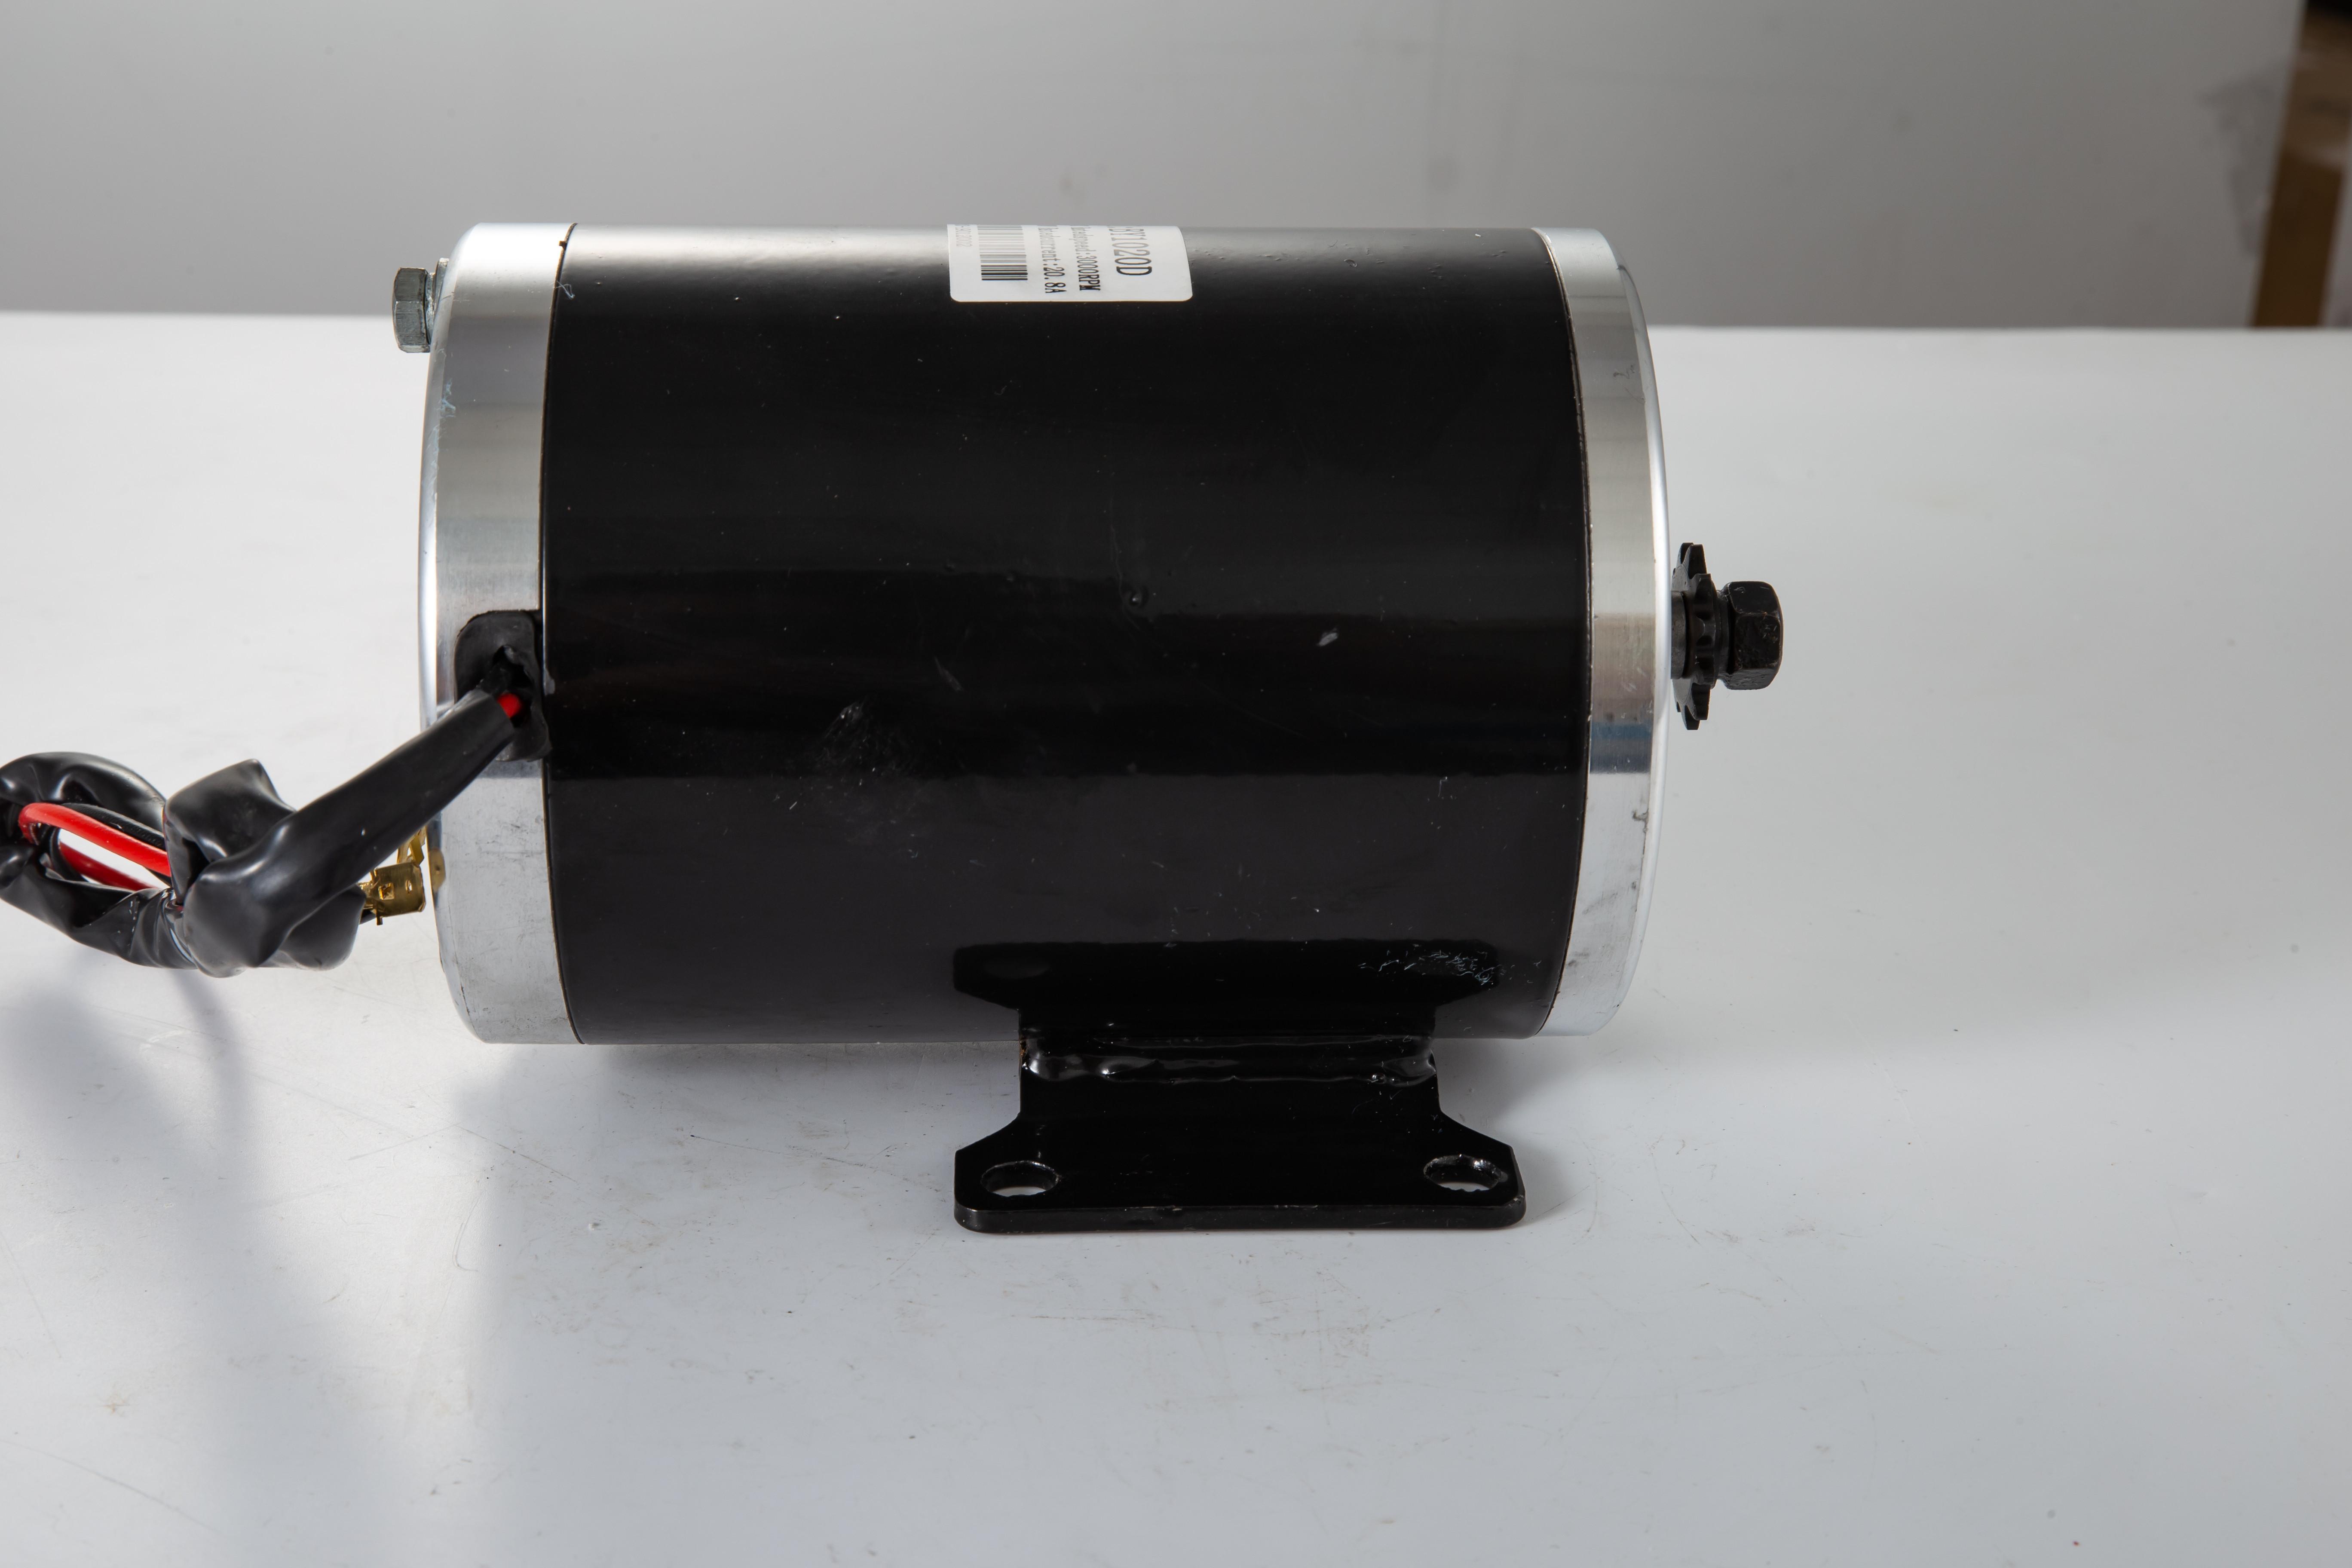 1800W-48V-DC-Brushless-Electric-Motor-Kit-f-Scooter-500-1800W-E-Bike-Go-Kart thumbnail 100